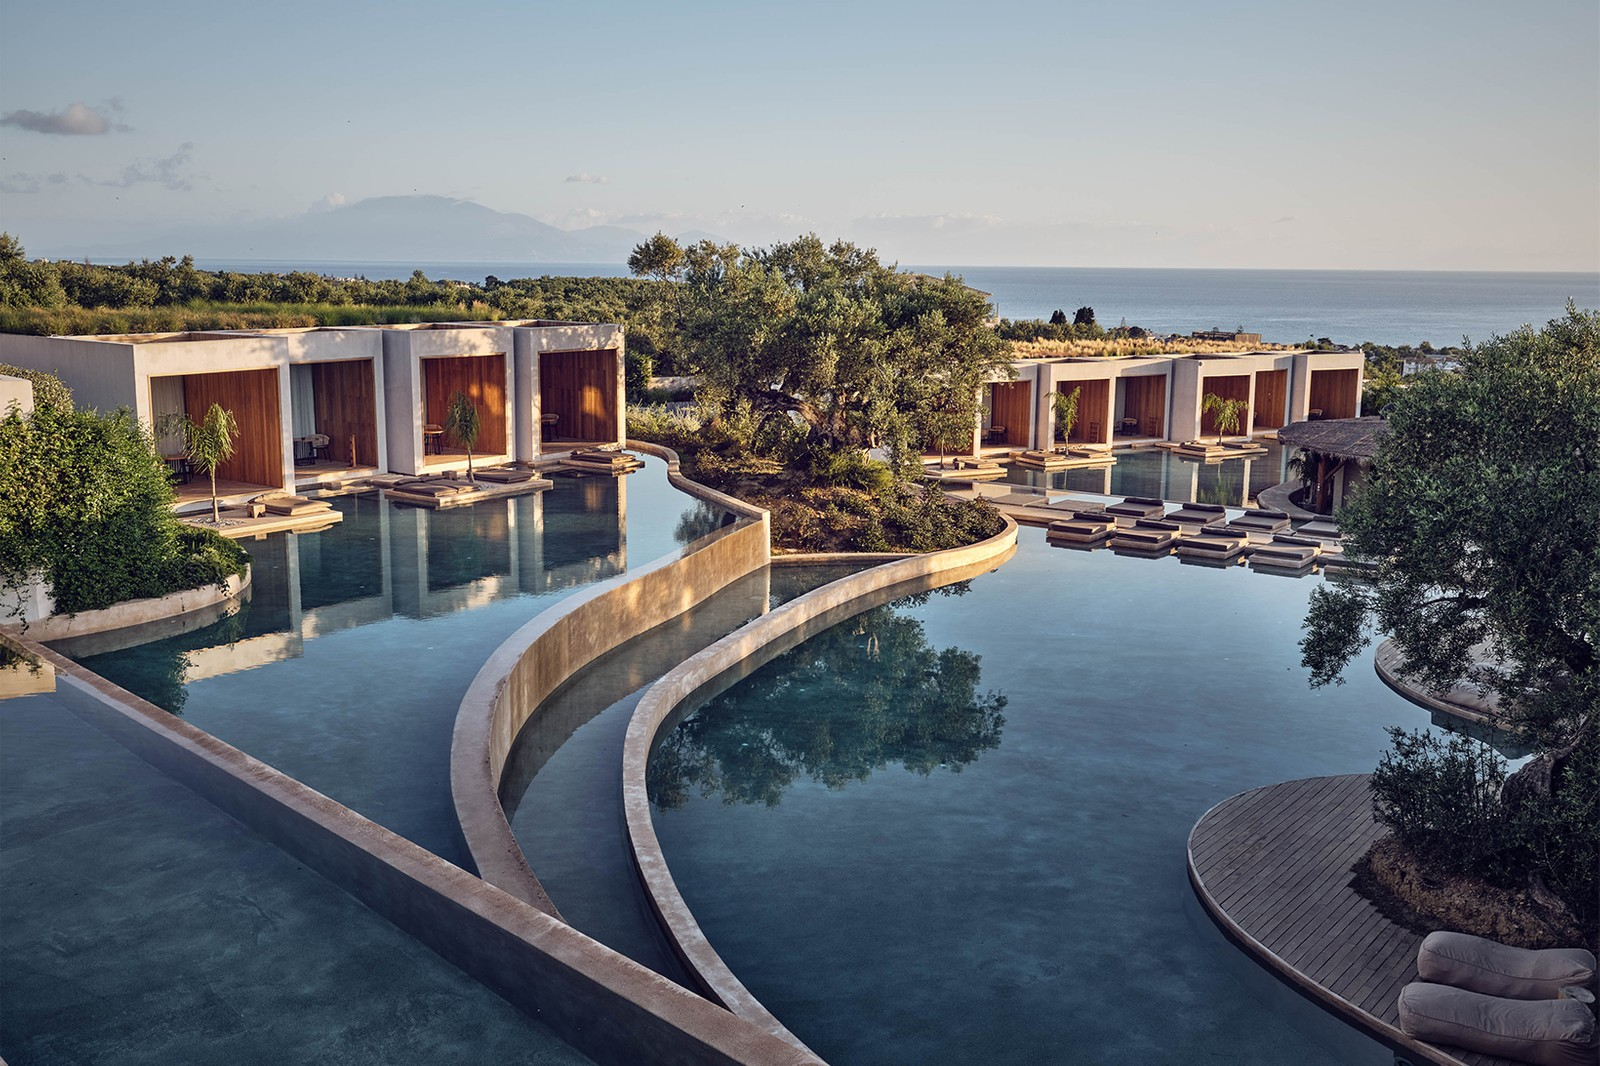 Canaves Oía Epitome Katikies Mykonos Hotel Luxury Resort Villa Greek Island Greece Travel Infinity Pool Ocean Sea Sunset Private